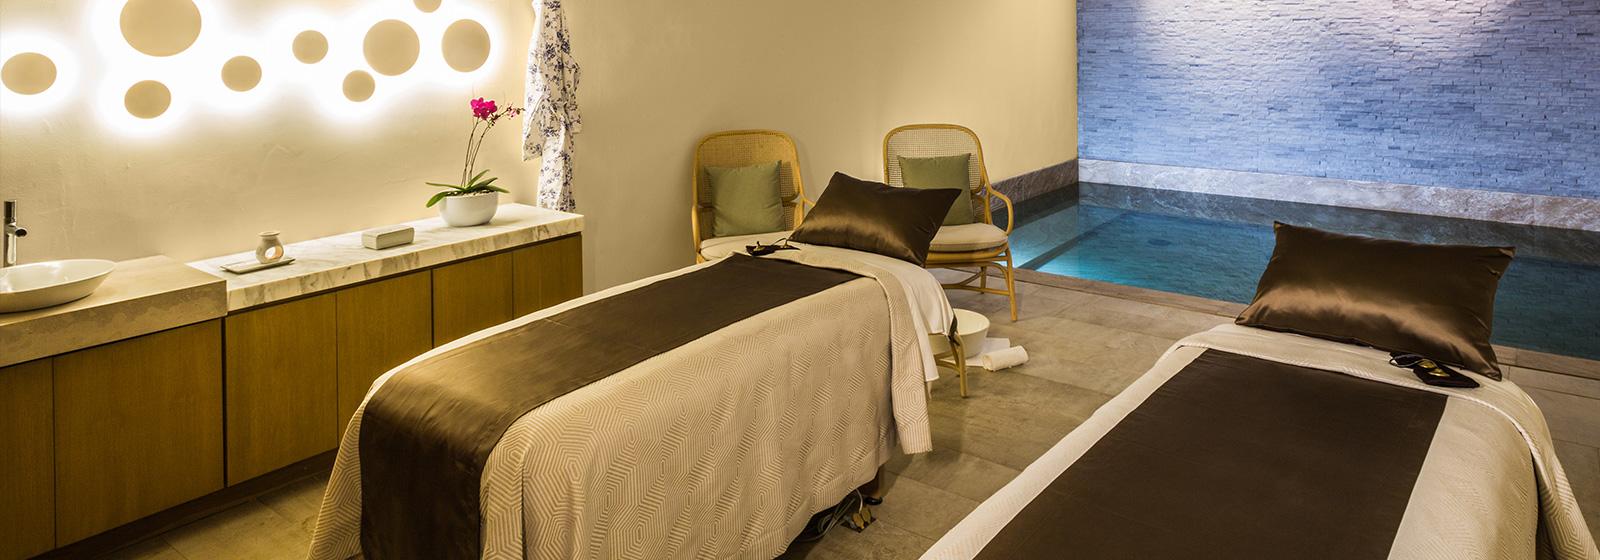 A couple's massage at SE Spa.